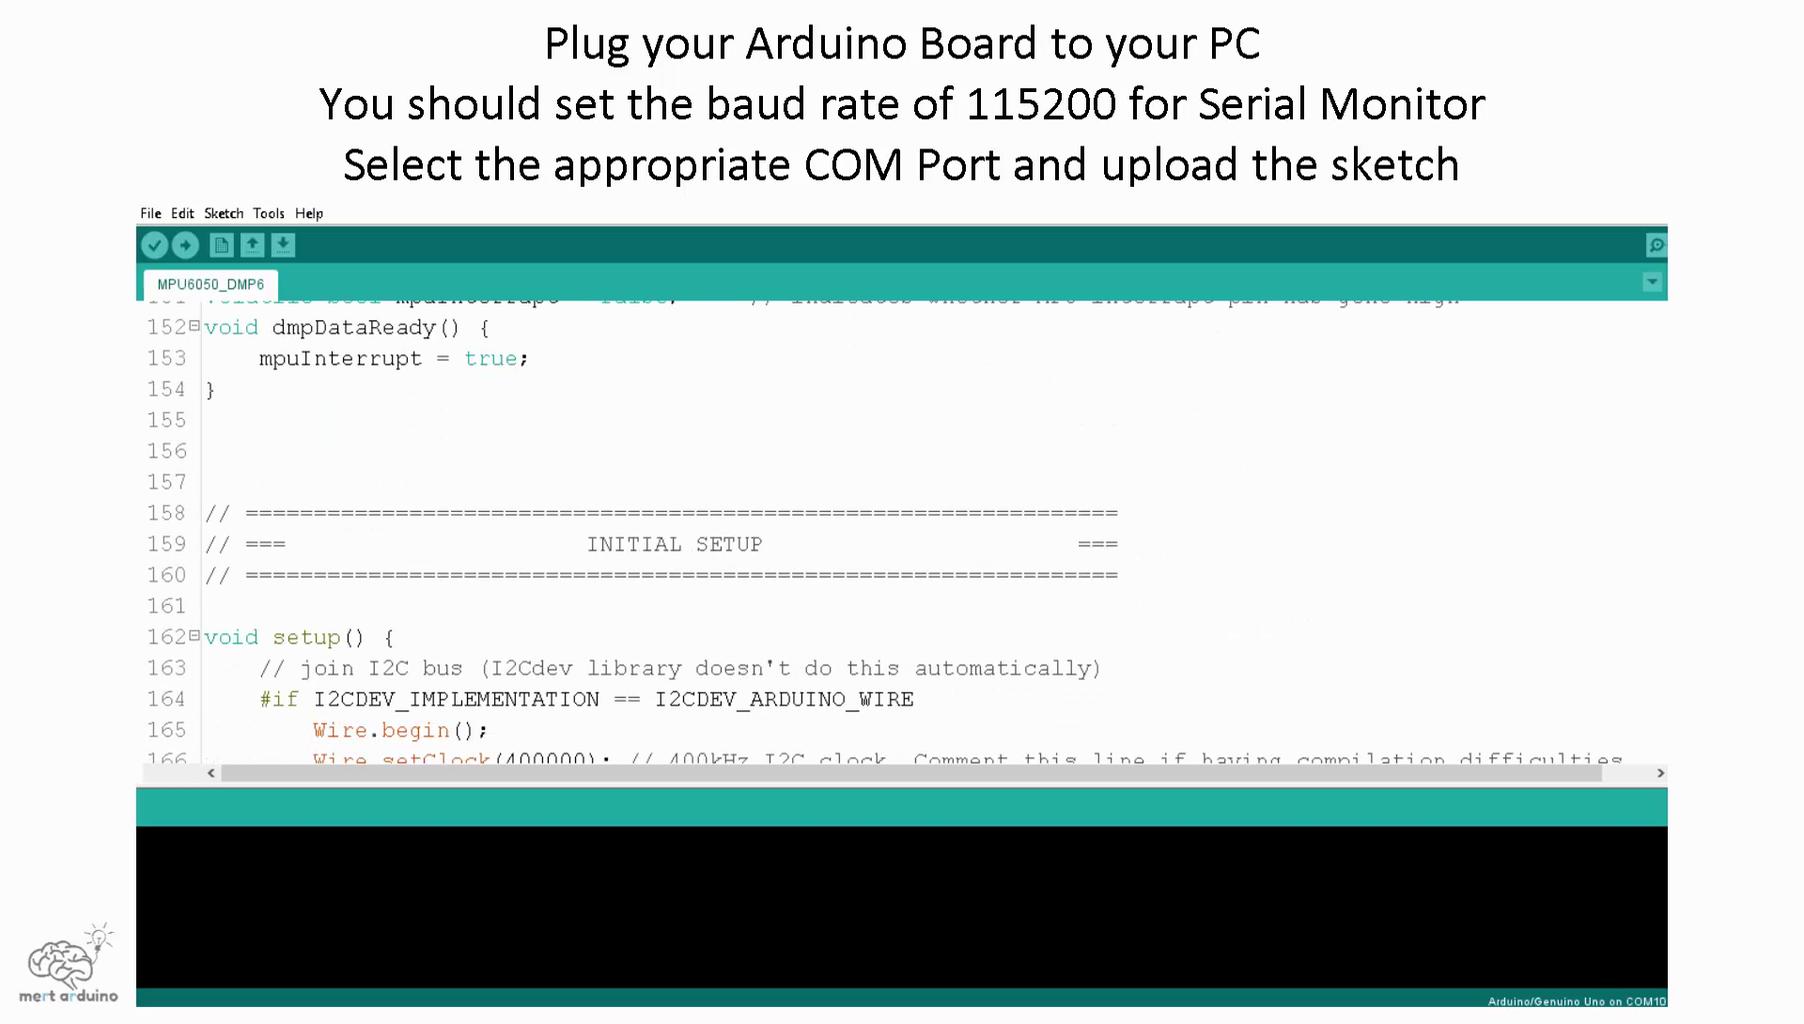 Uploading the Code and Testing the MPU6050